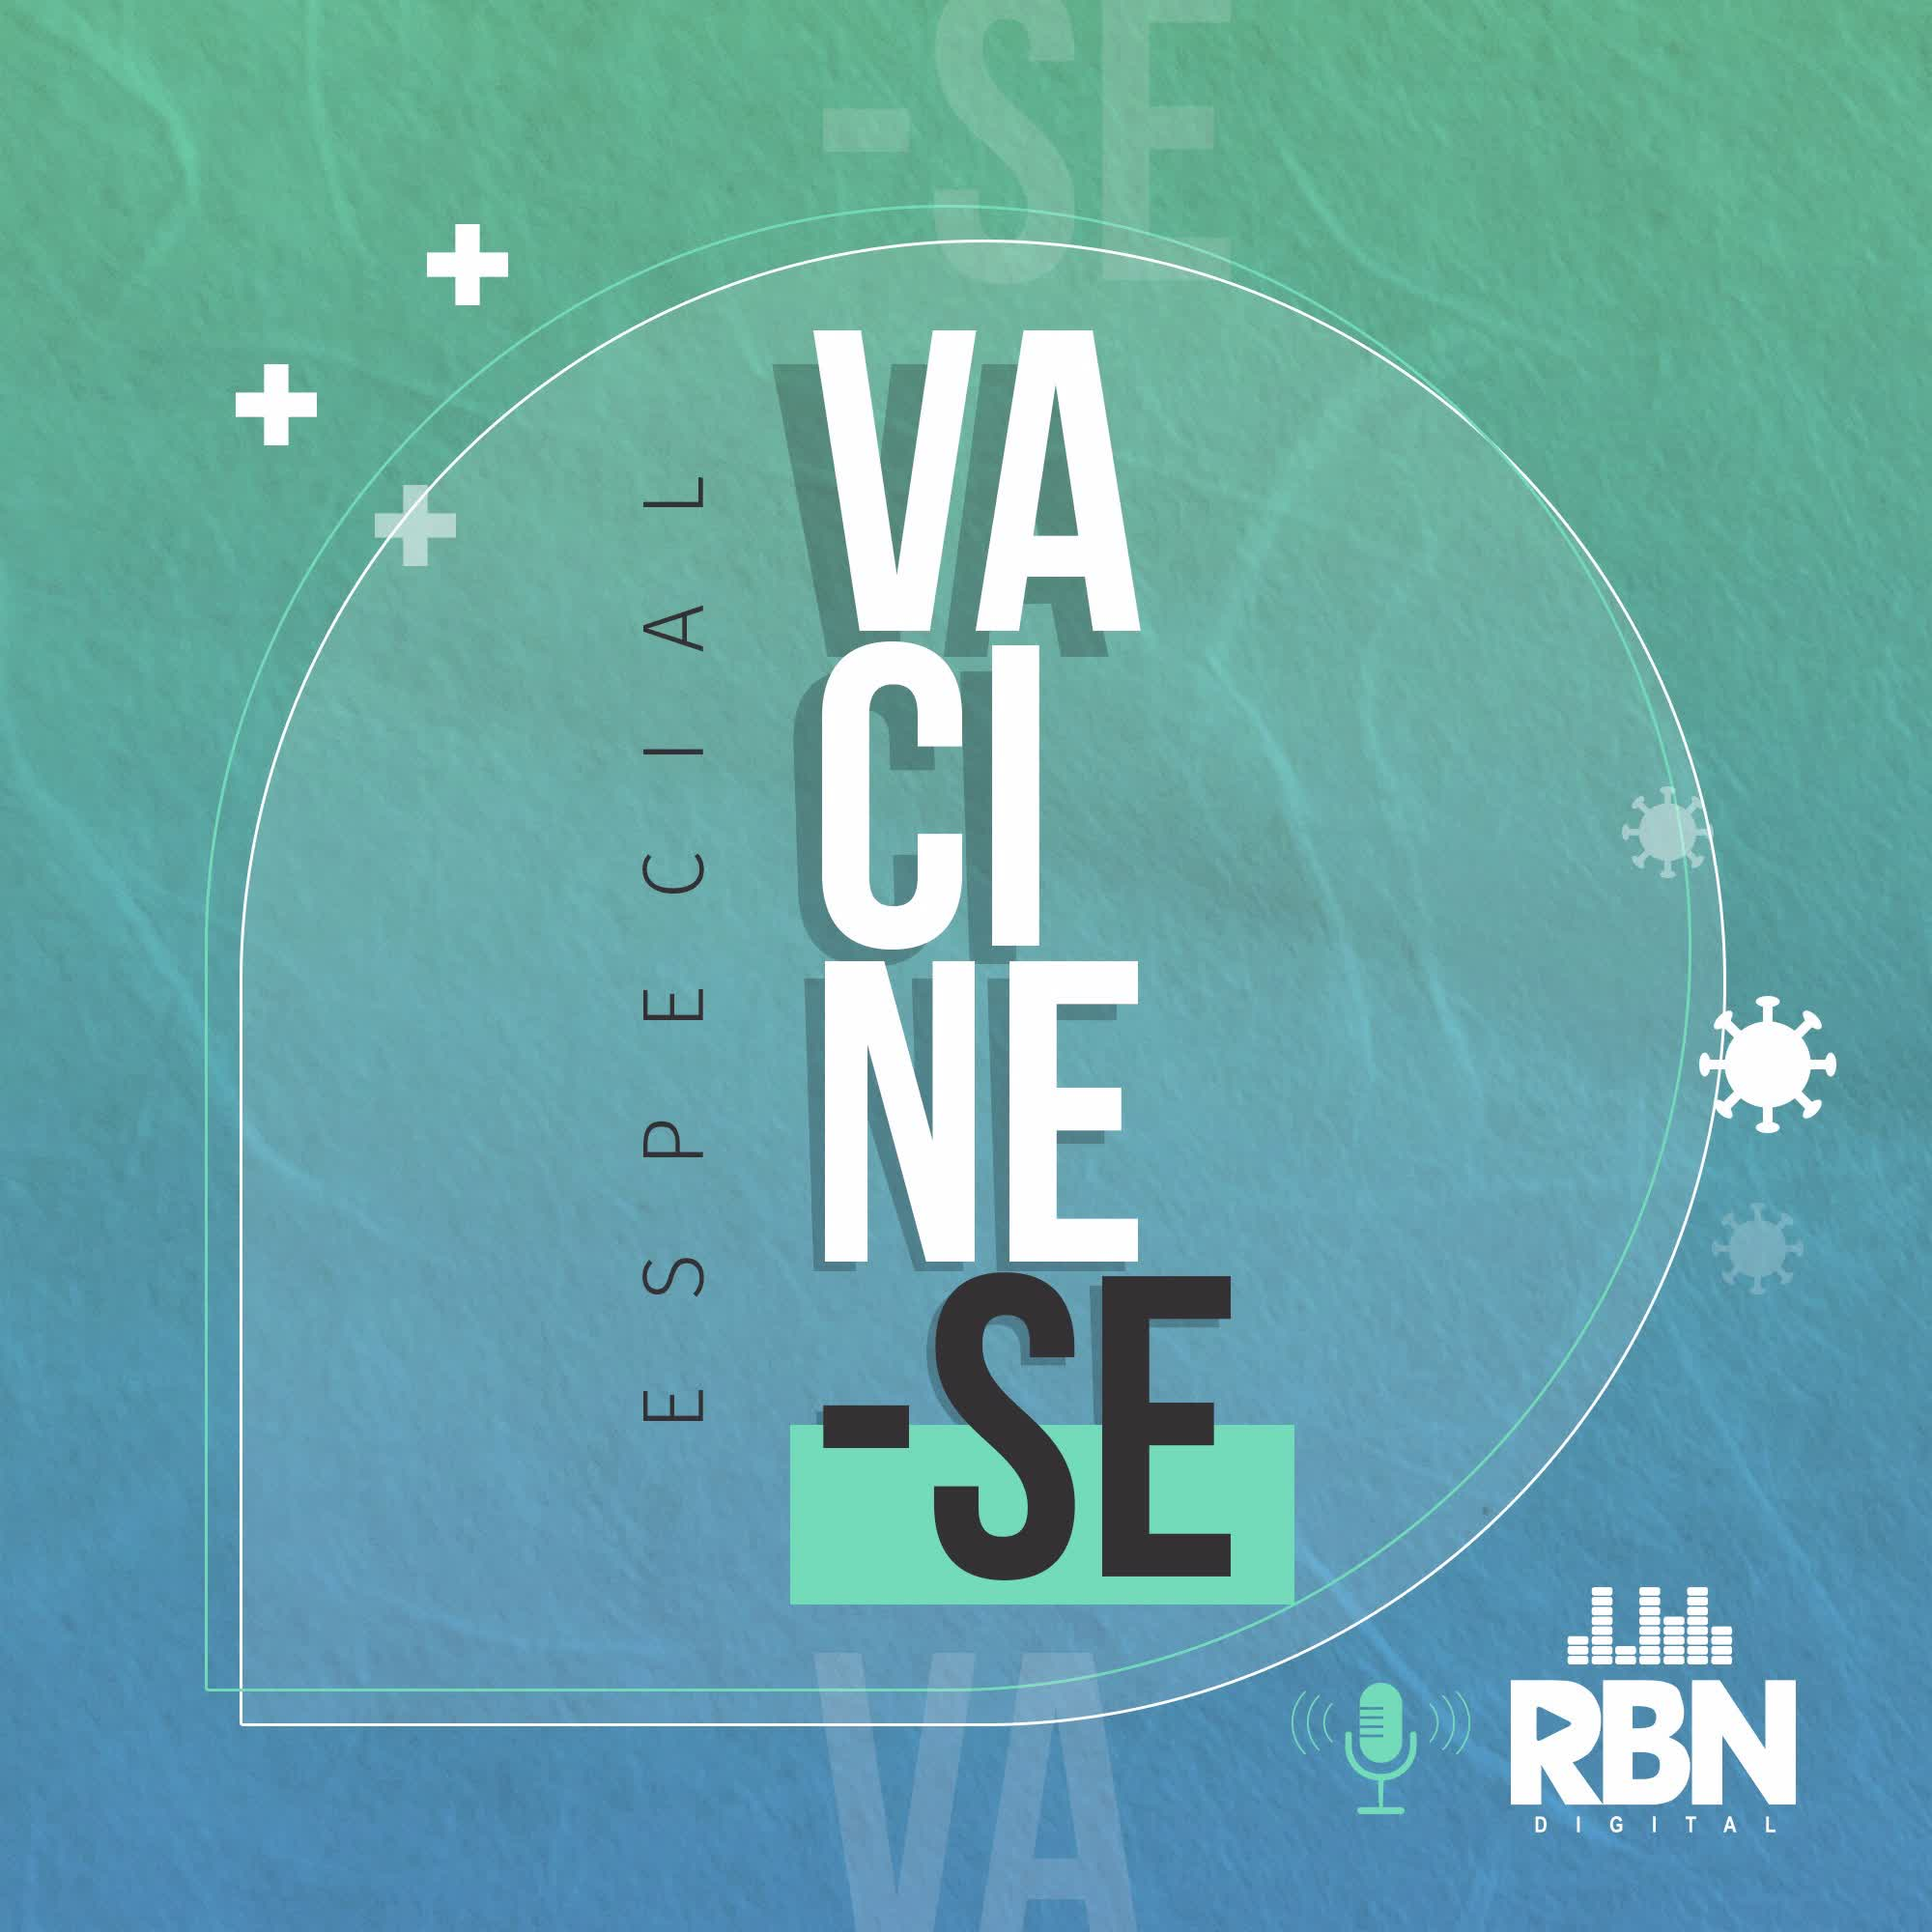 Vacine-se - RBN